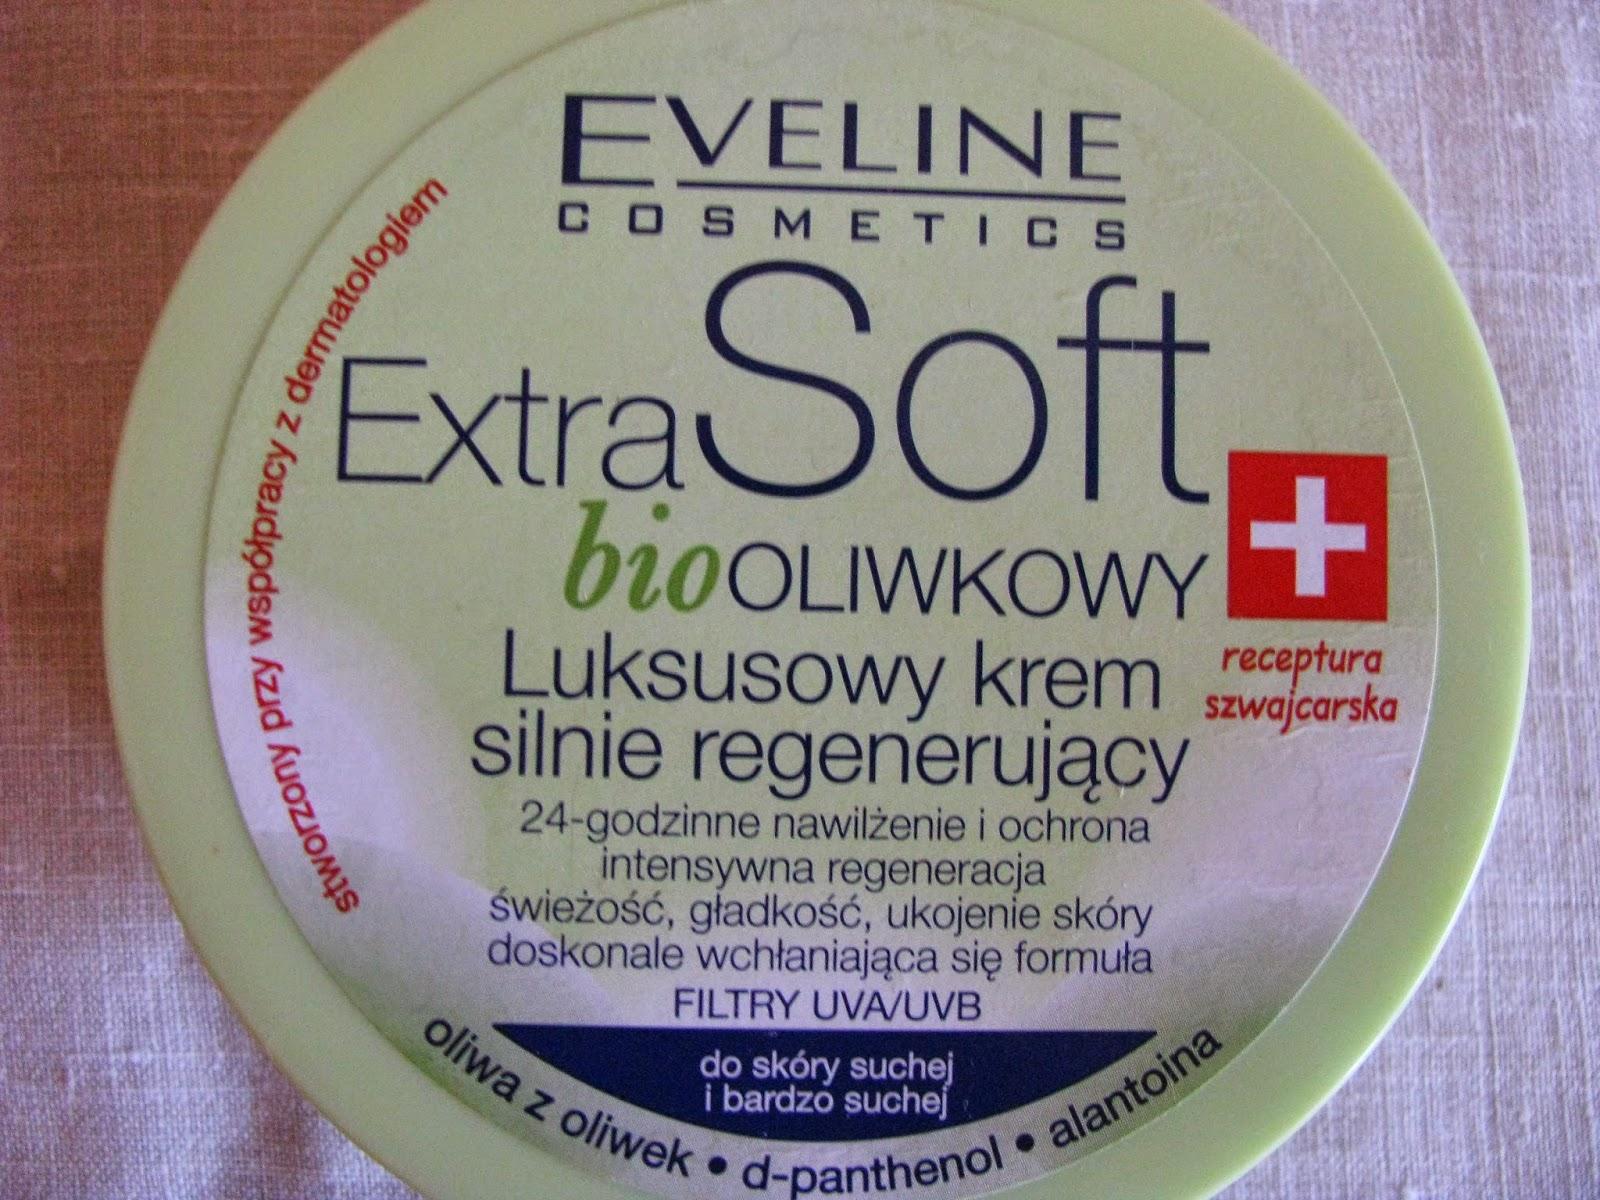 http://jzabawa11.blogspot.com/2014/04/eveline-extrasoft-biooliwkowy-krem.html